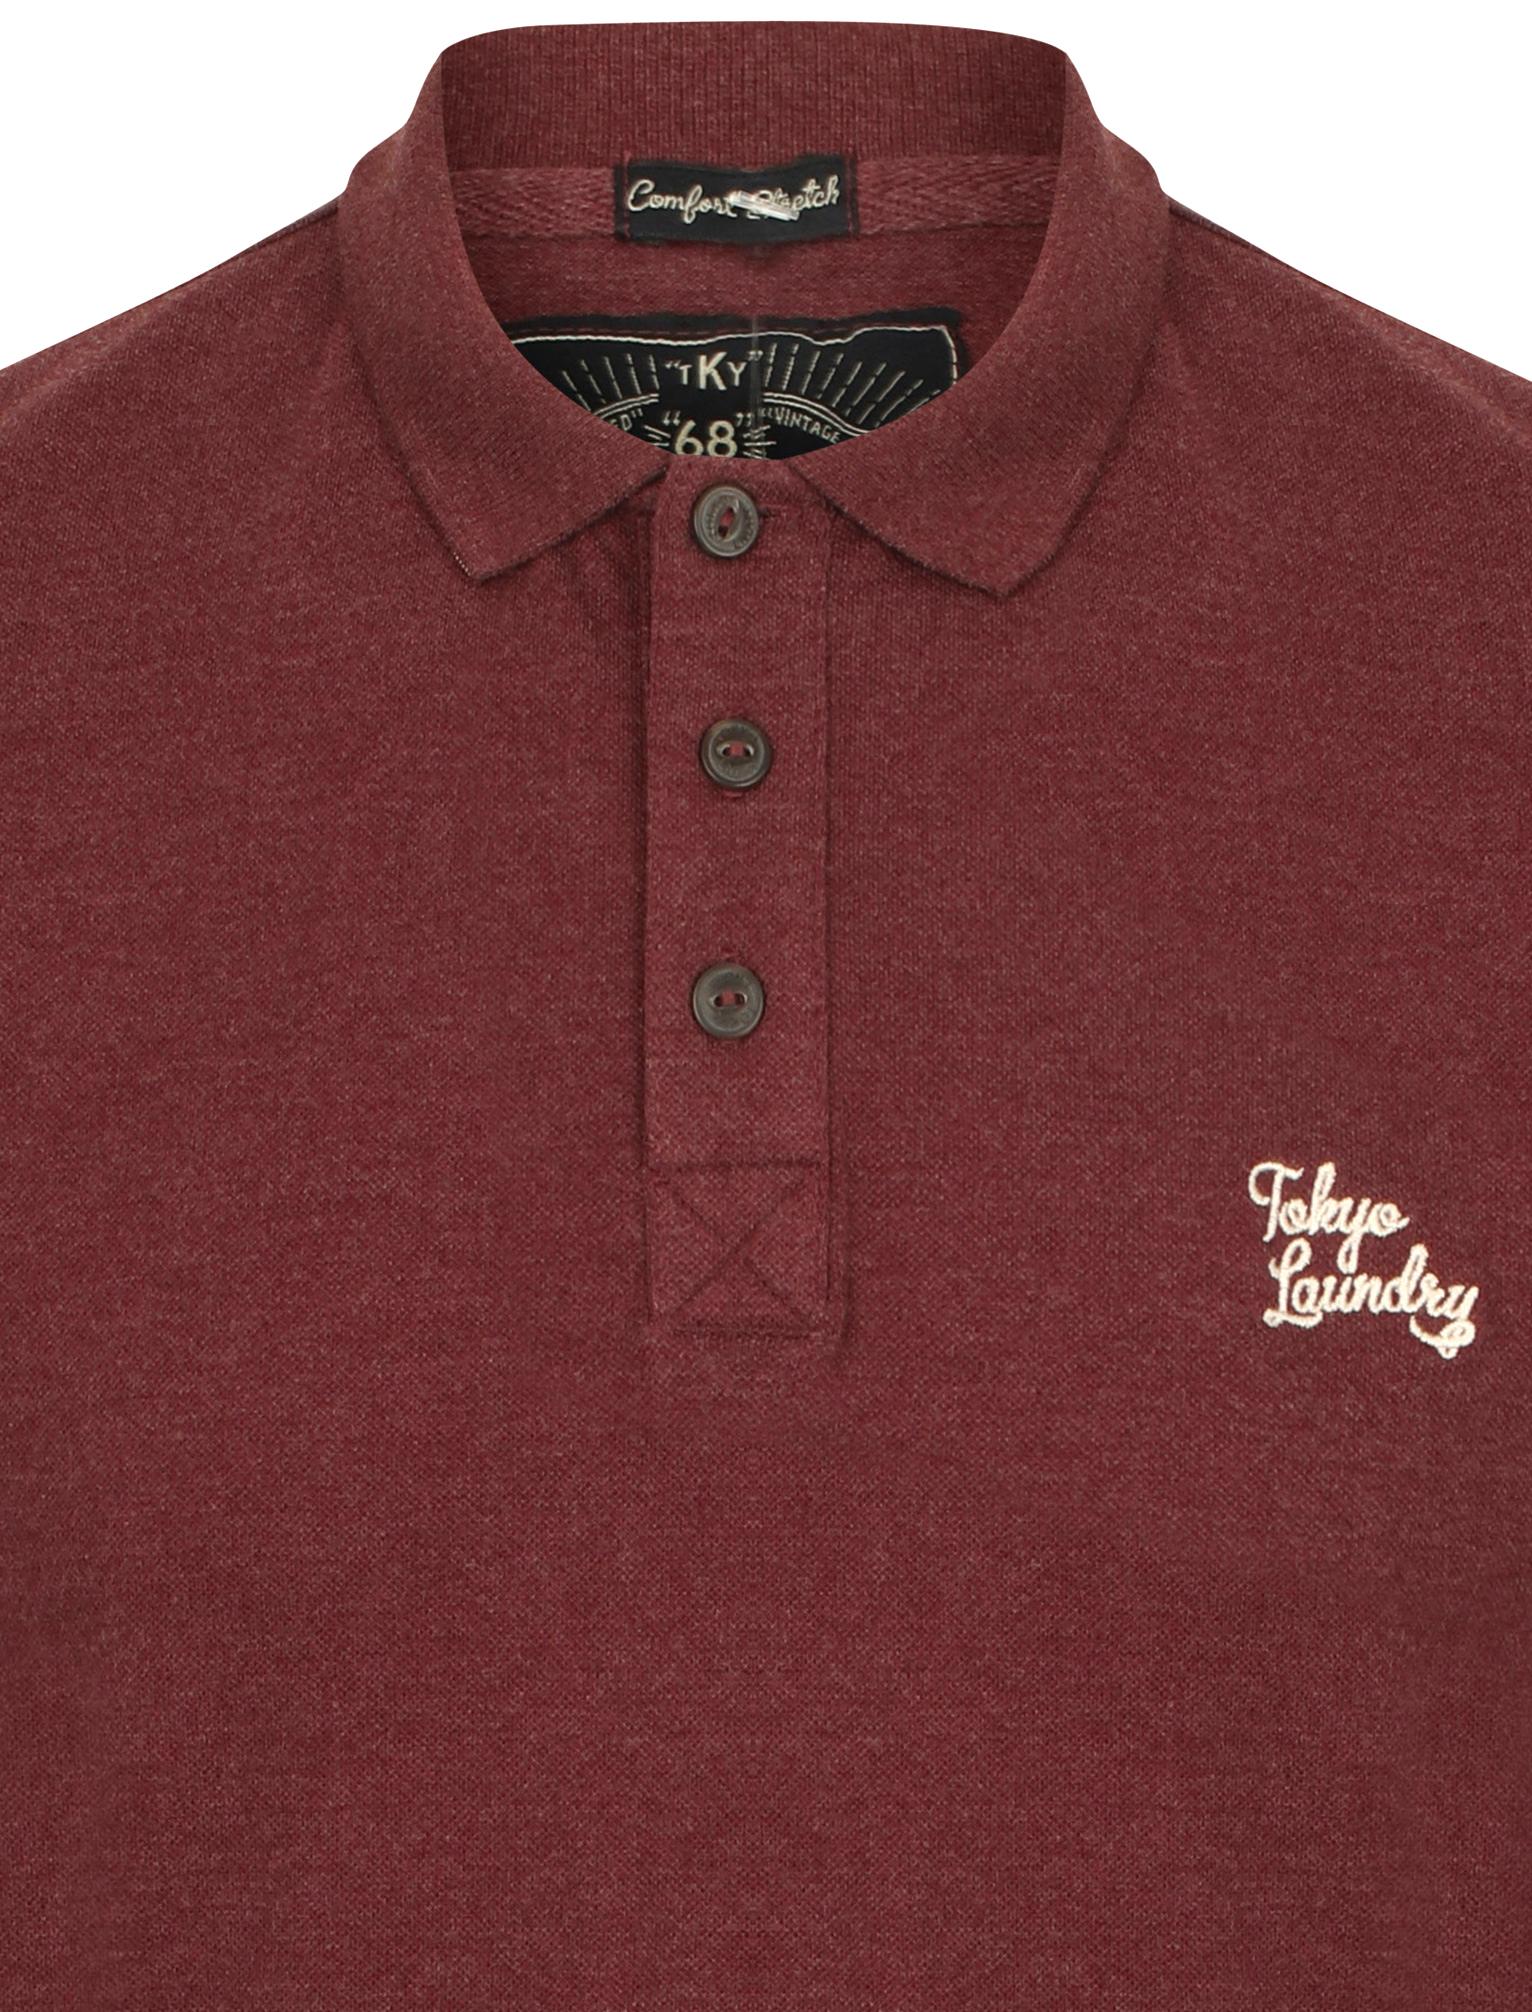 New-Mens-Tokyo-Laundry-Branded-Kuusamo-Cotton-Rich-Pique-Polo-Shirt-Size-S-XXL thumbnail 22